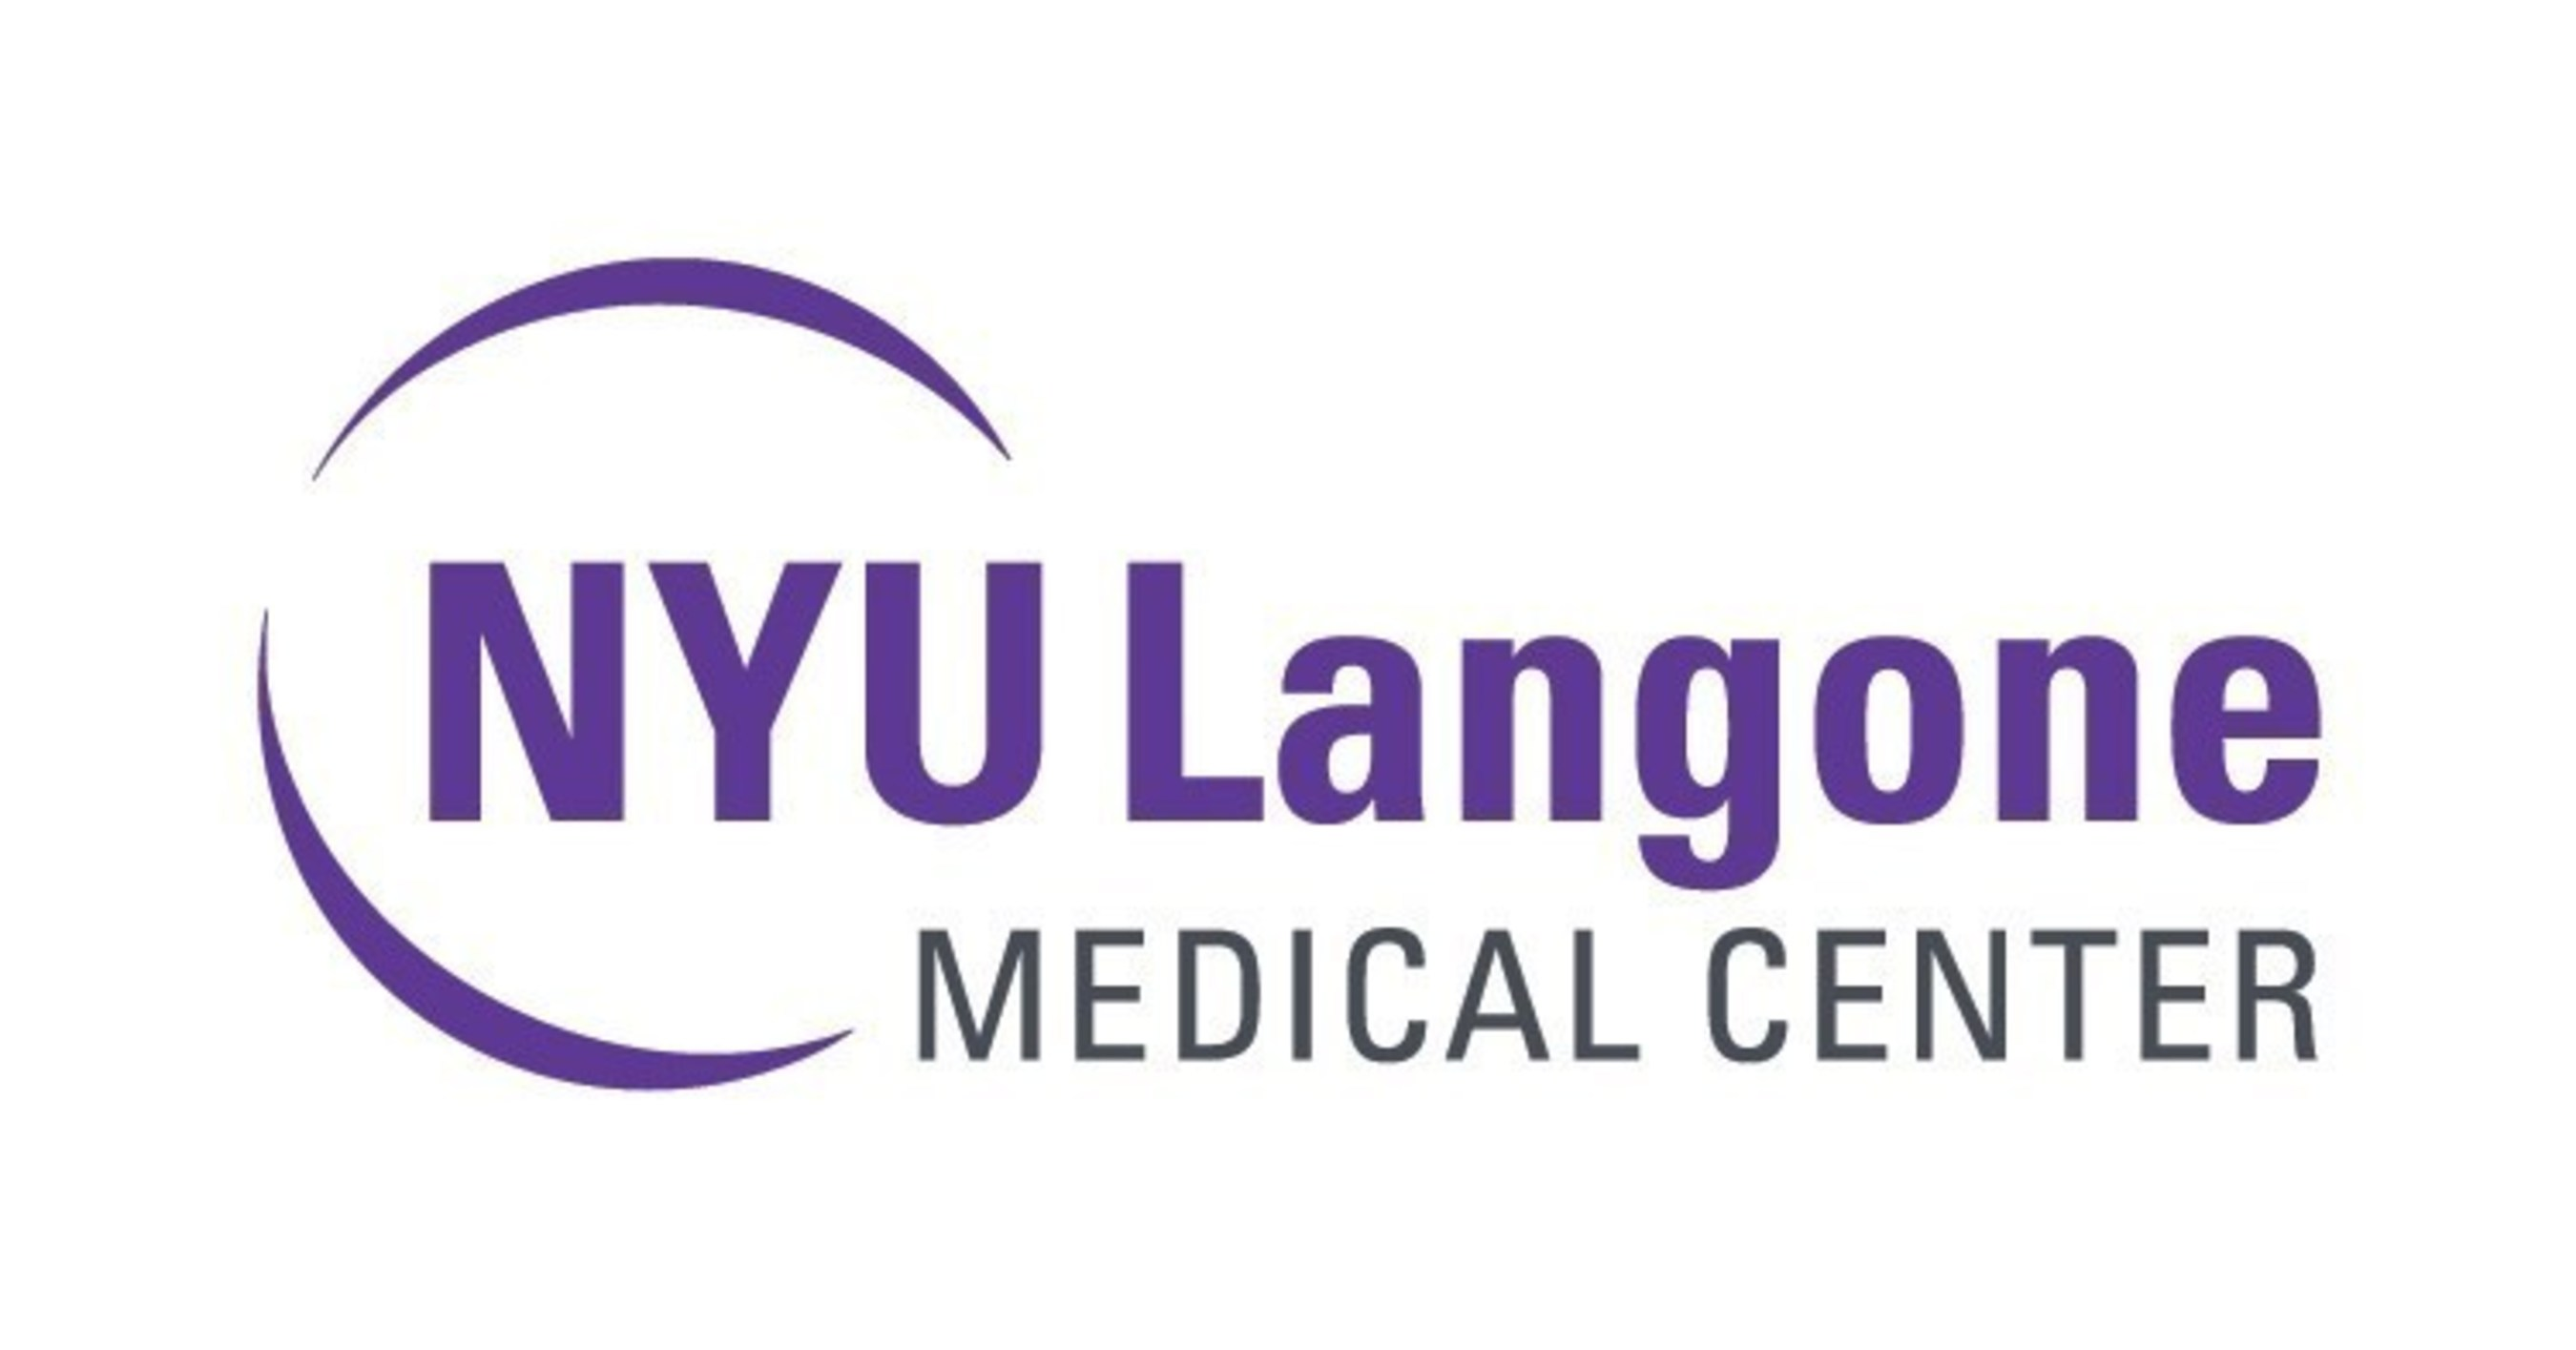 Nyu Langone Medical Center And Winthrop University Hospital To Affiliate